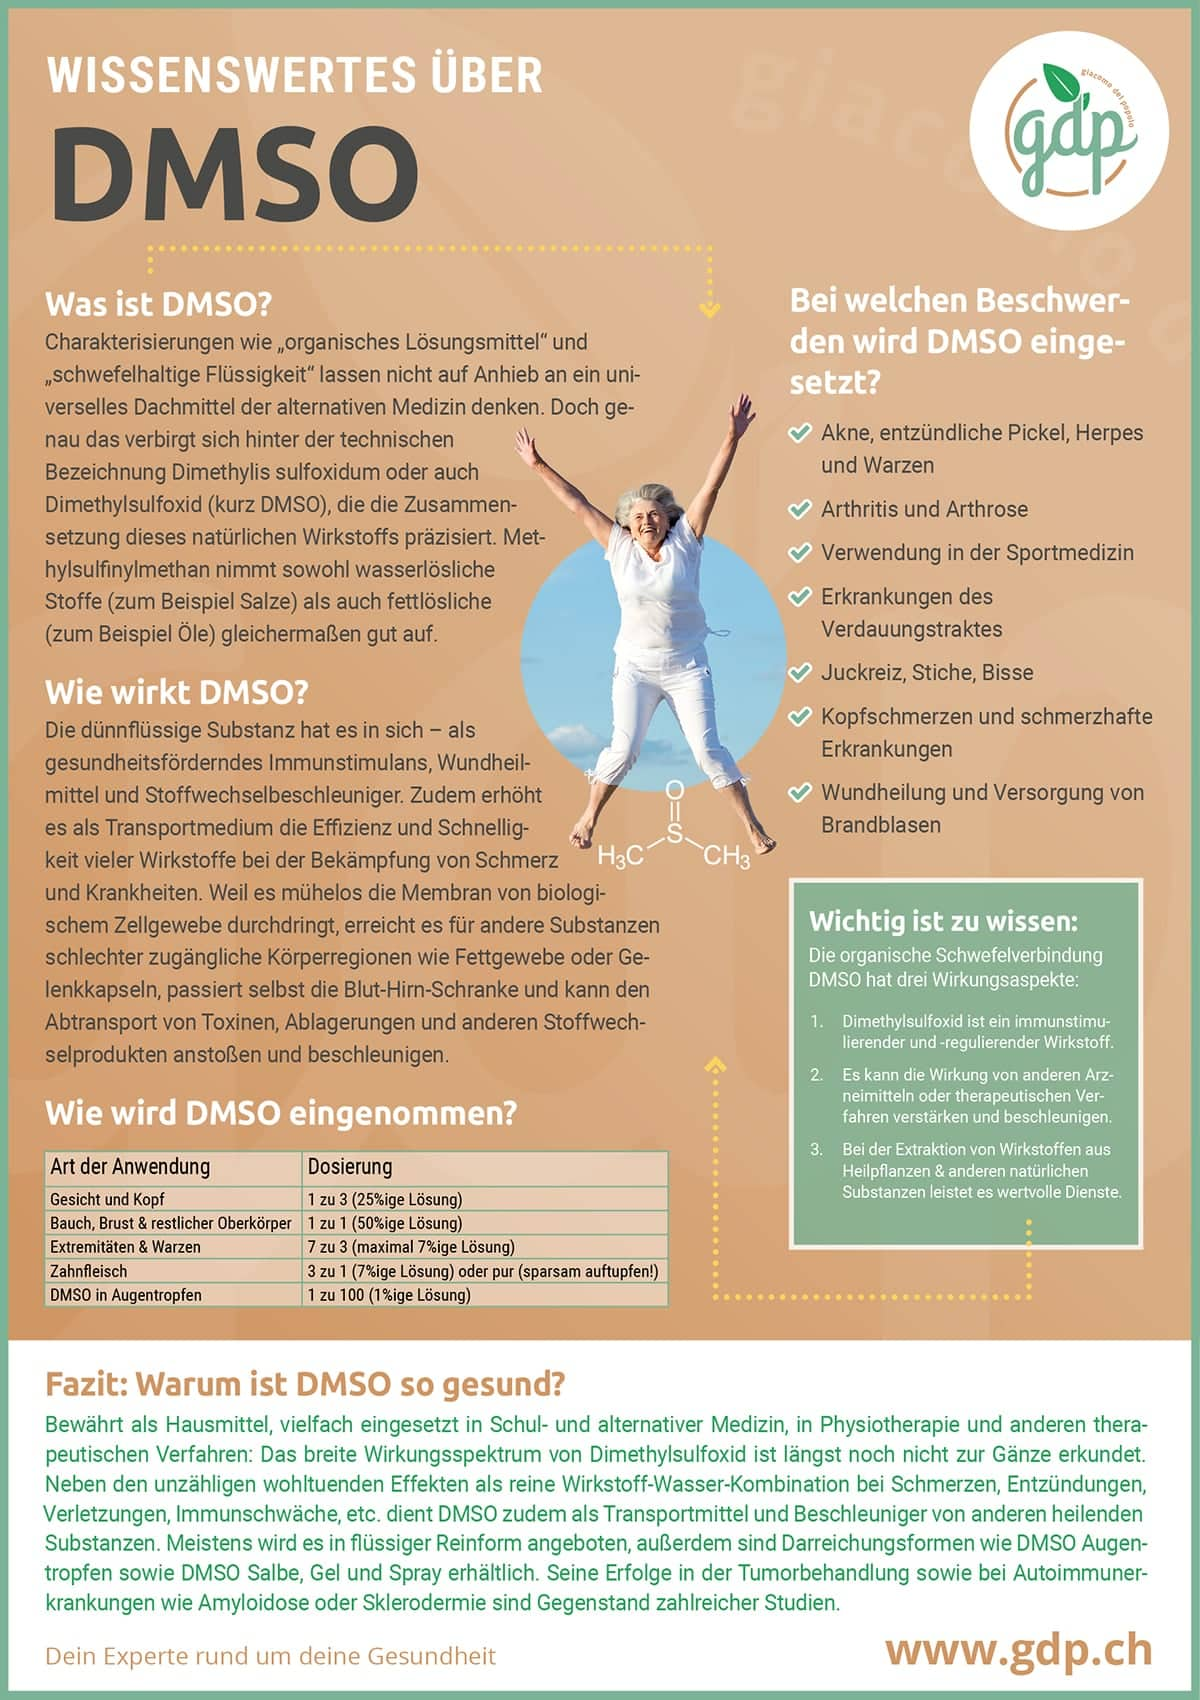 DMSO pib Infographie